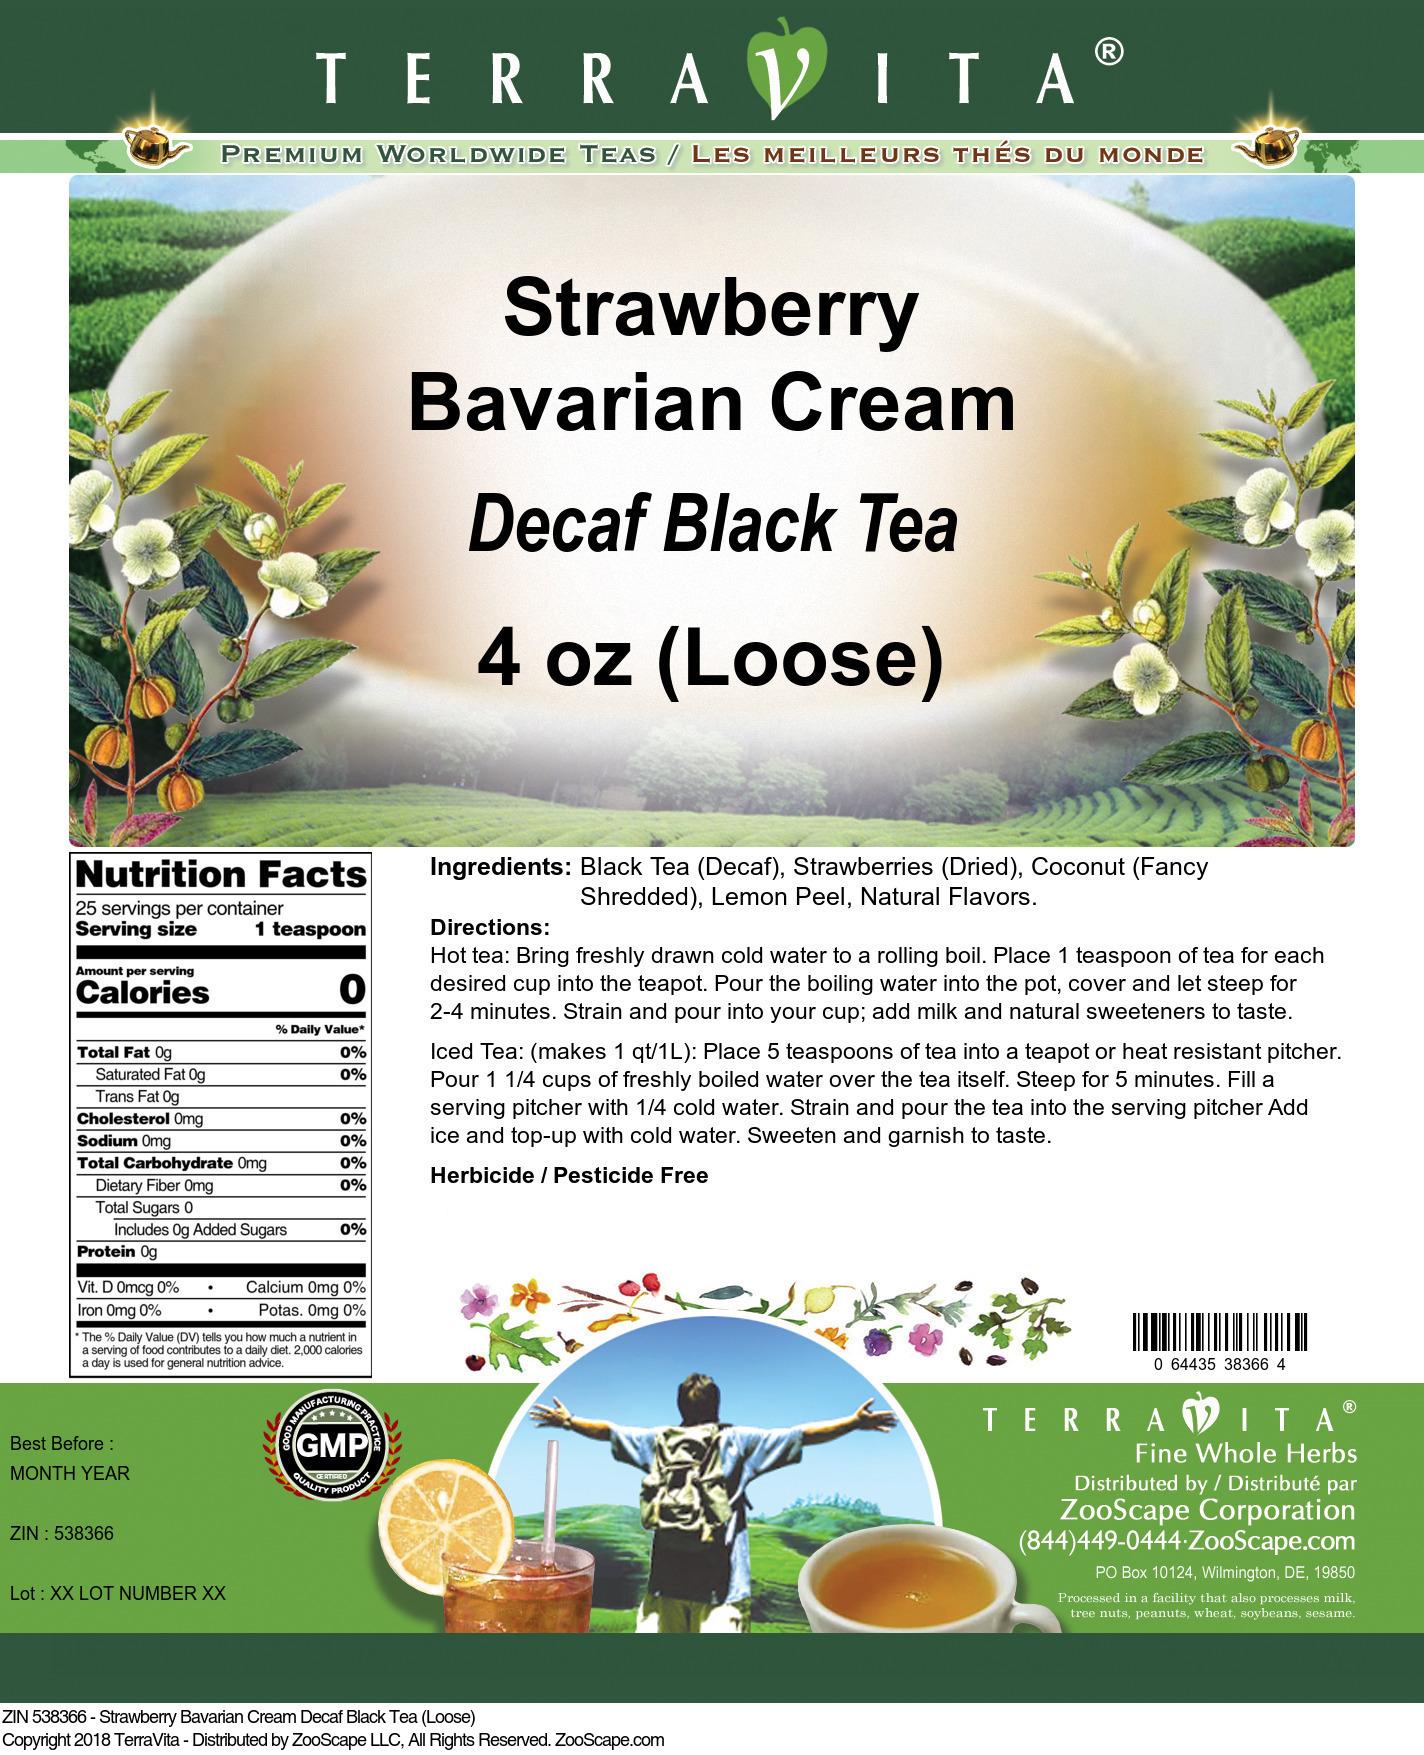 Strawberry Bavarian Cream Decaf Black Tea (Loose)